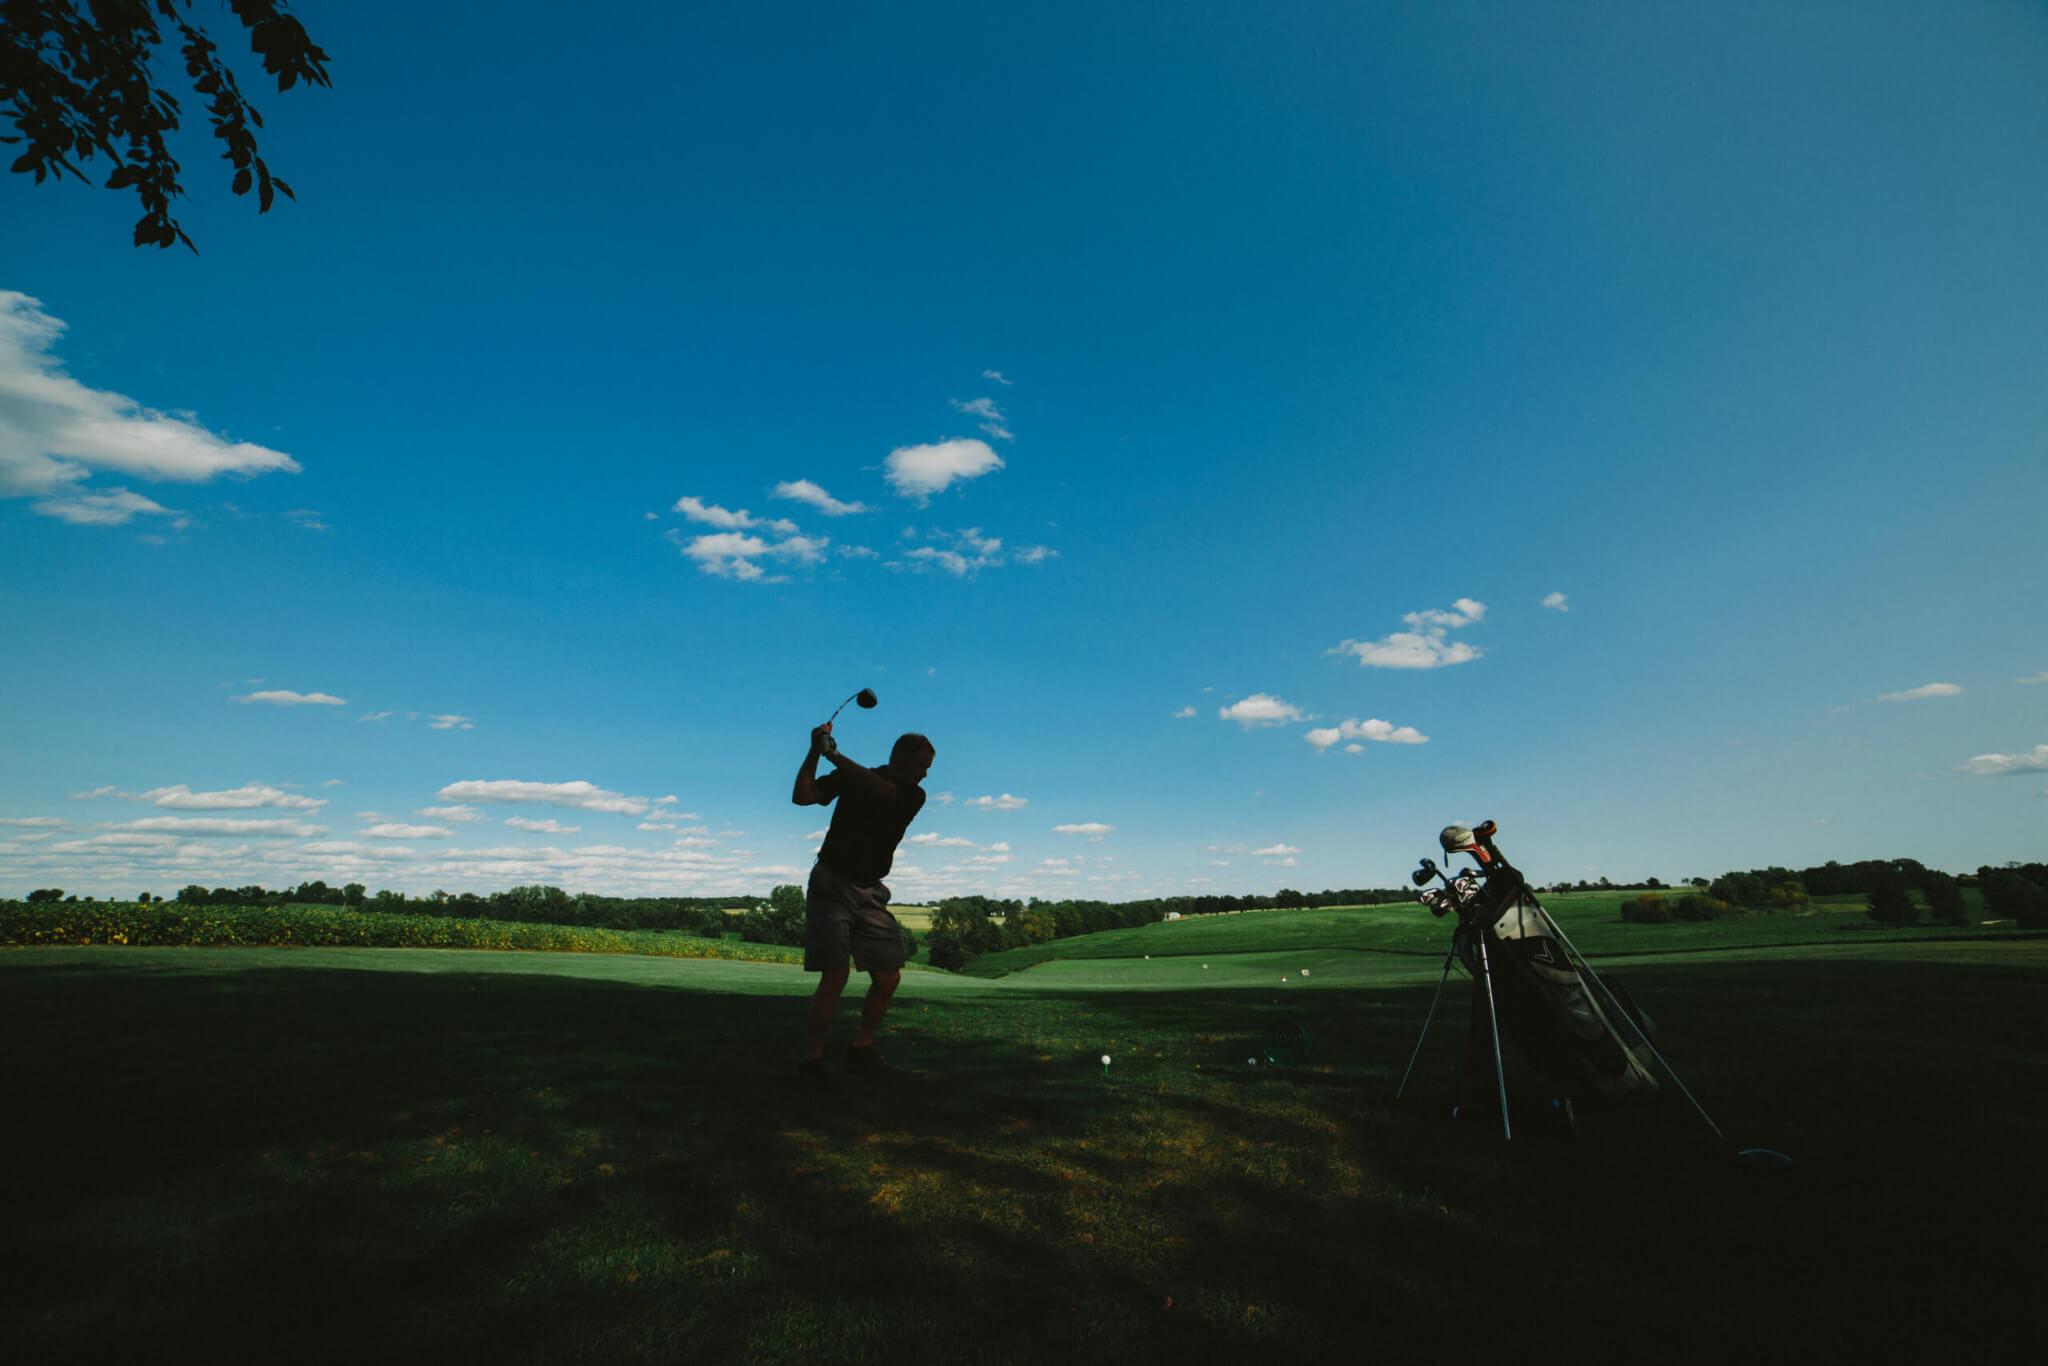 Golfer in shadows tees off